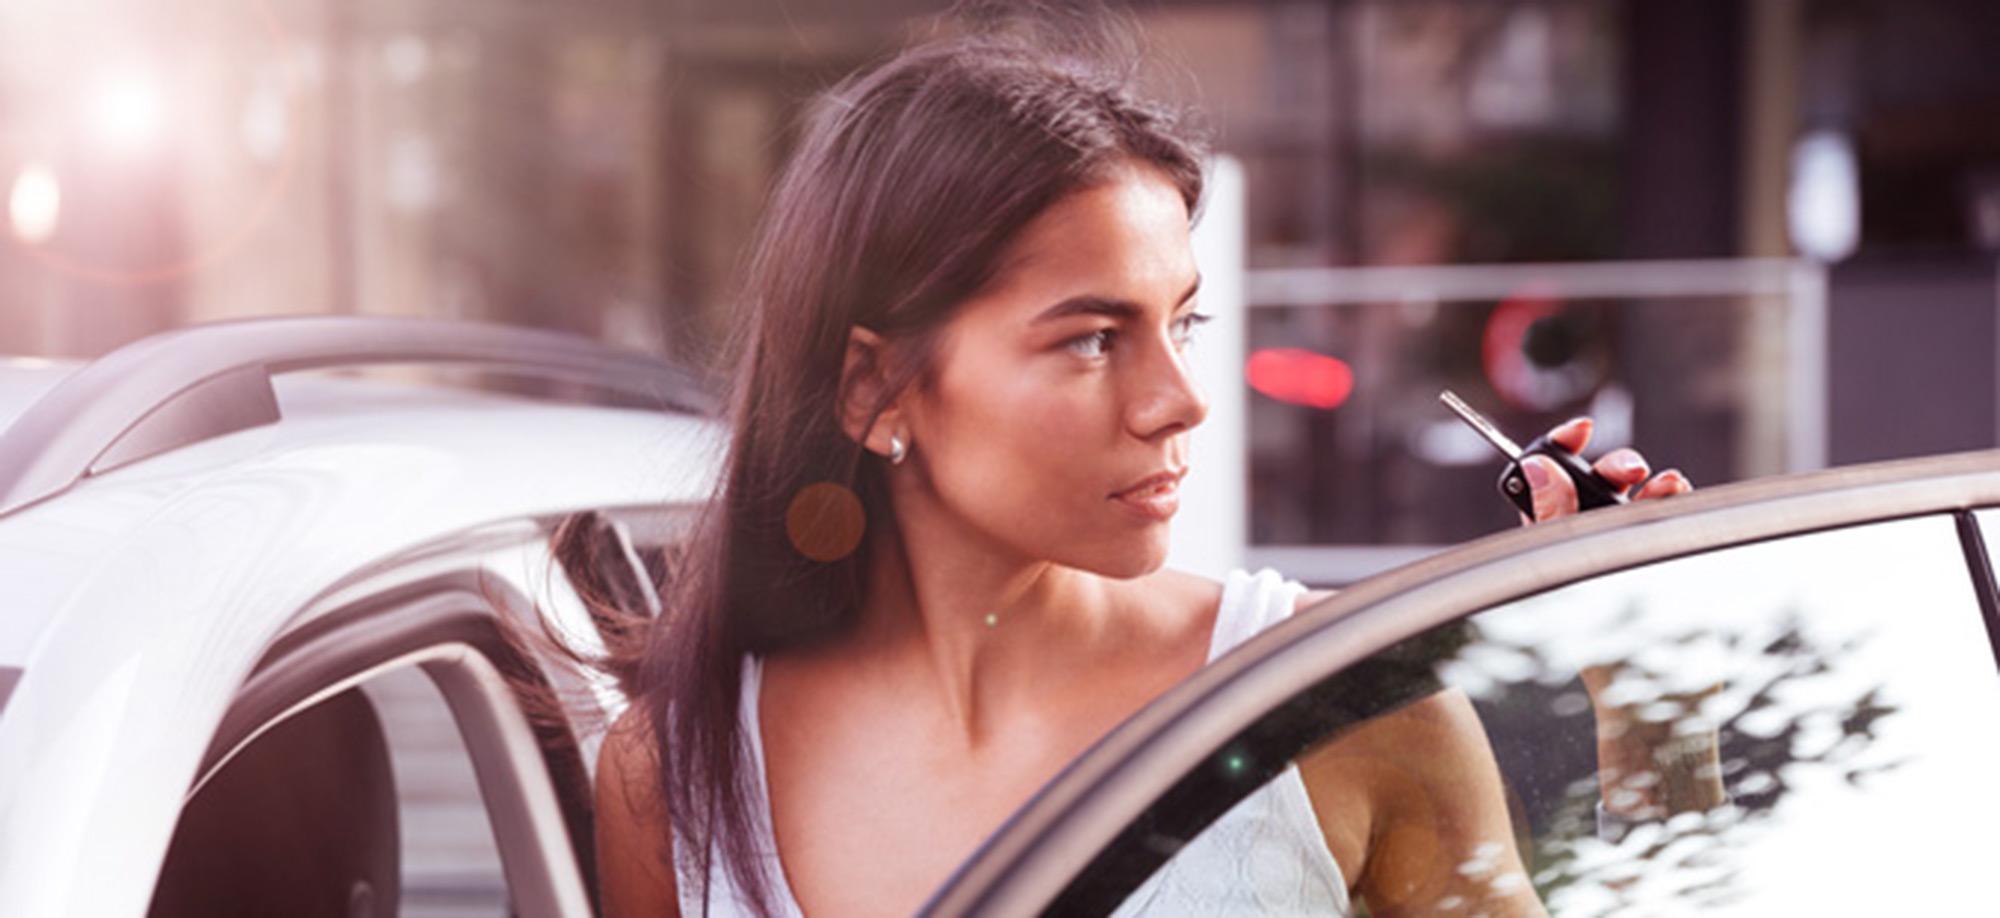 Elektromobilität Frau